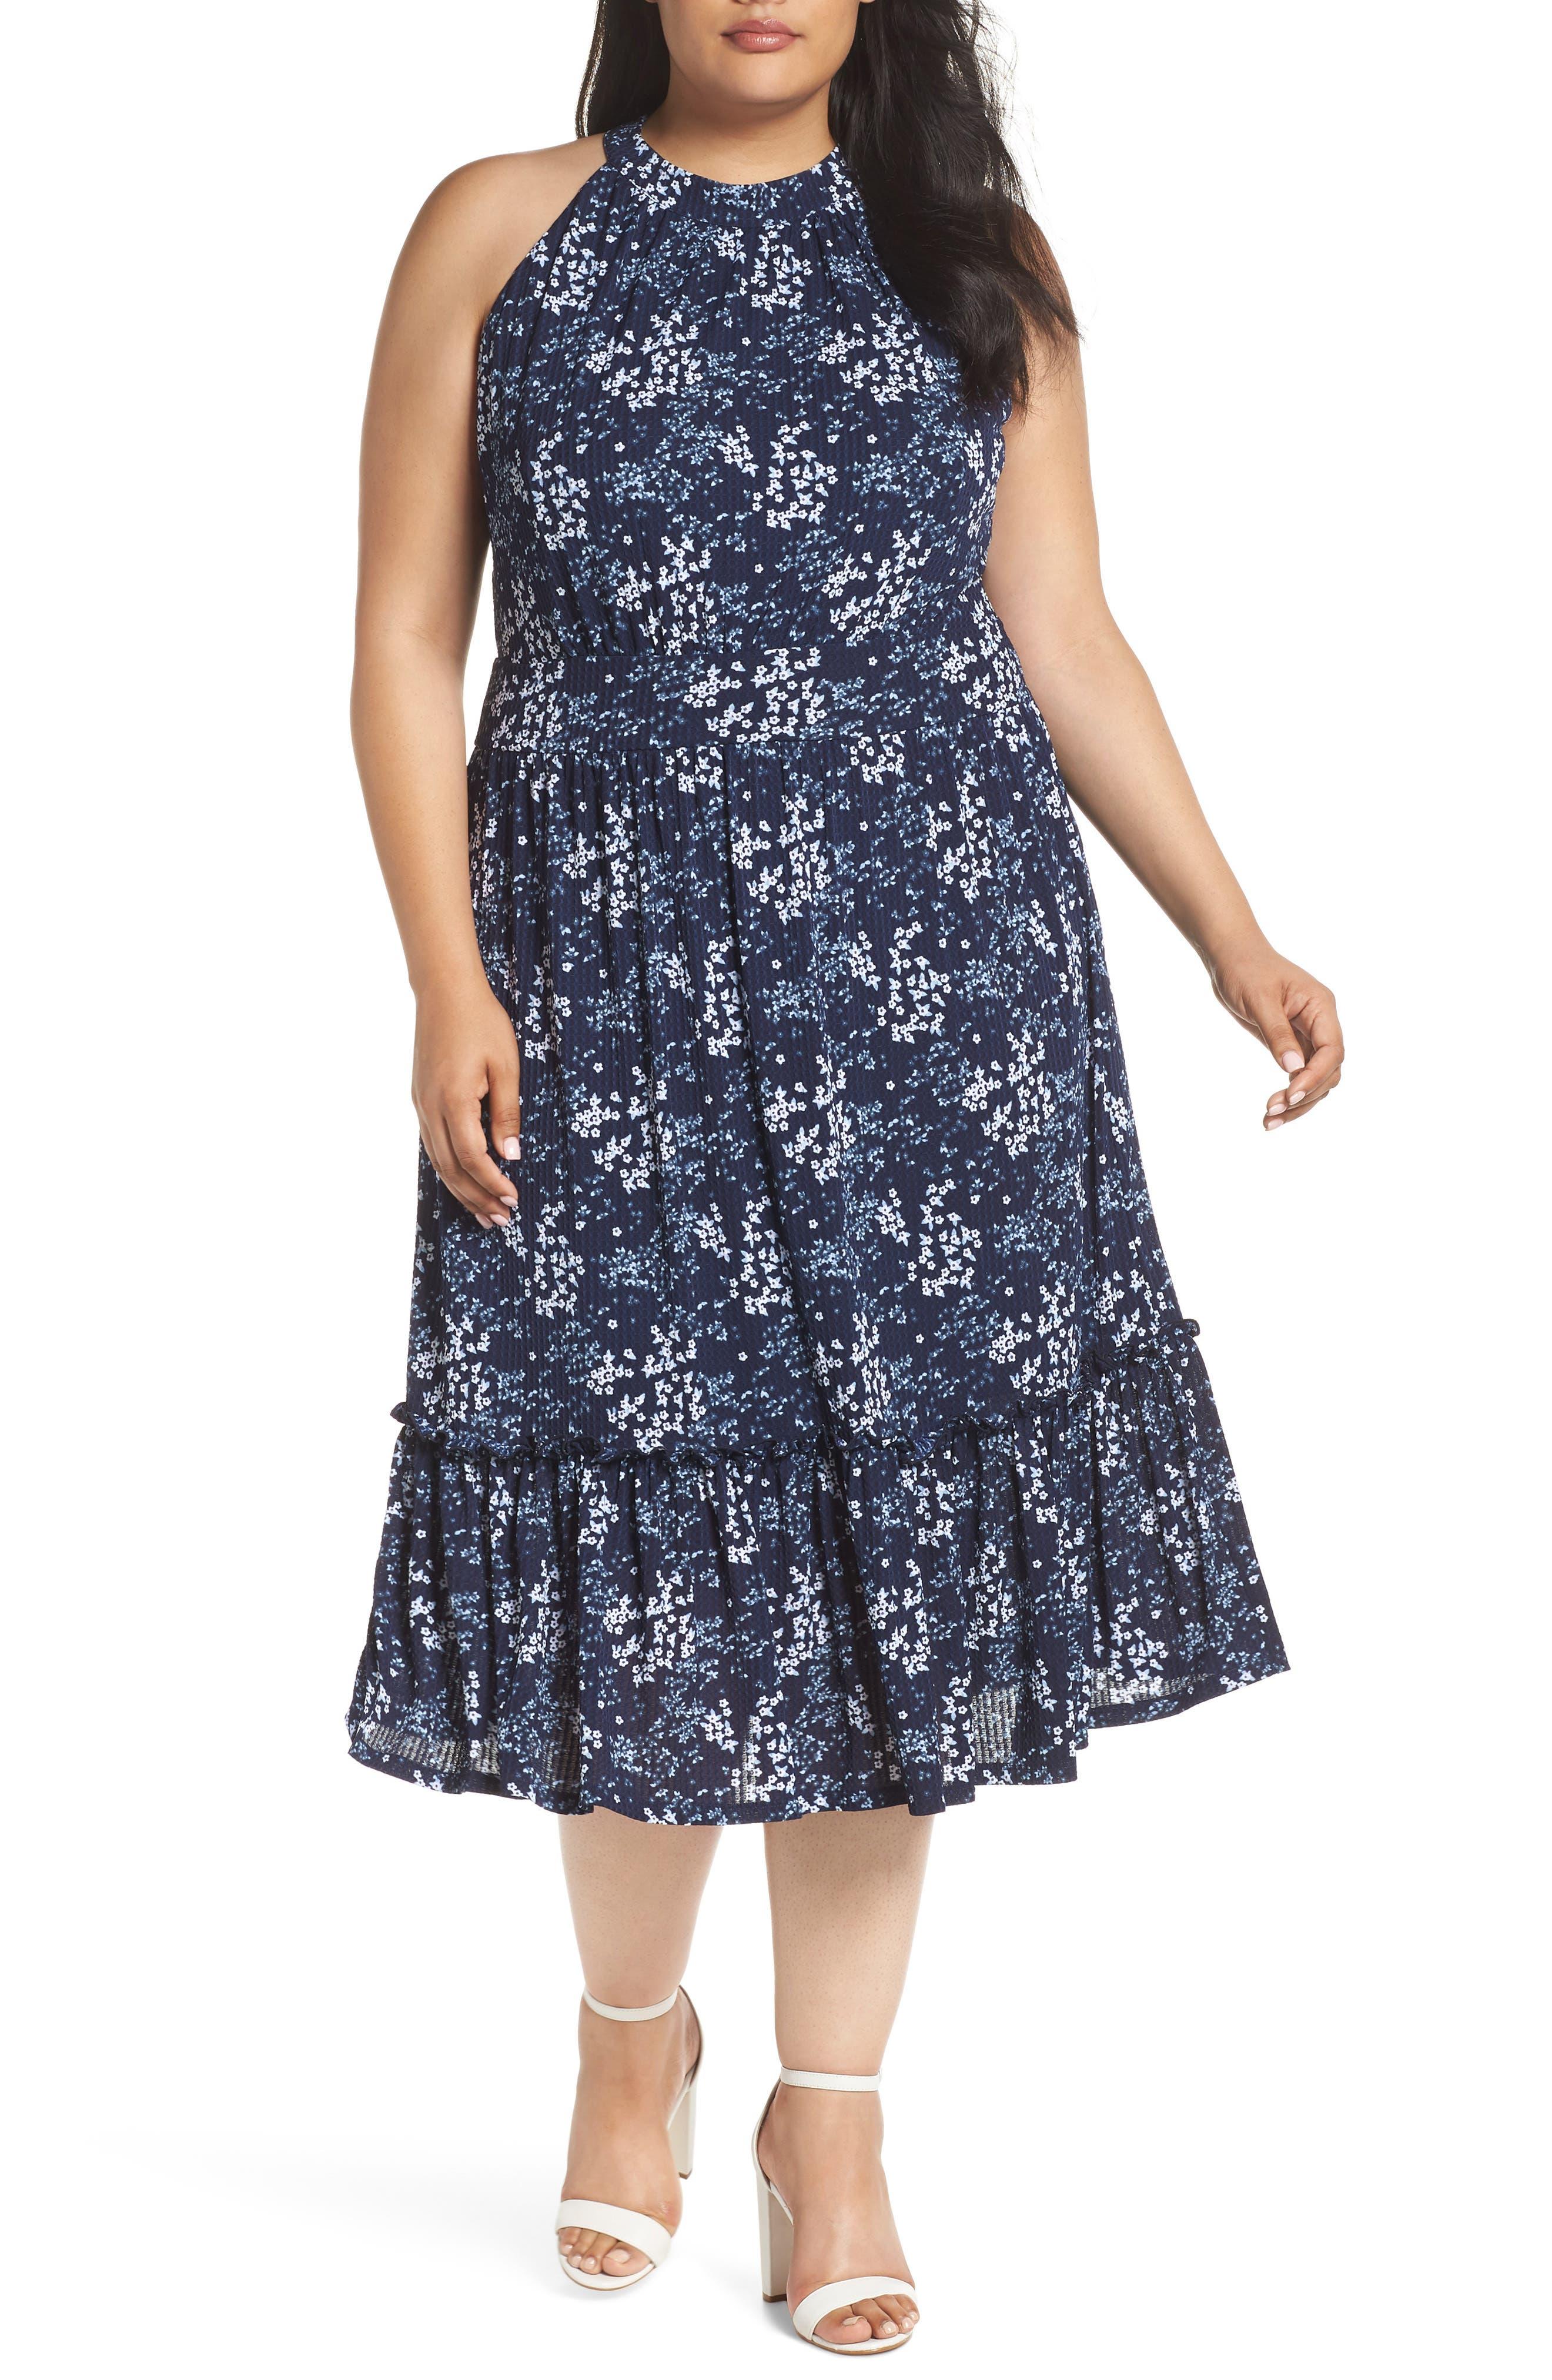 Floral Tiered Midi Halter Dress,                             Main thumbnail 1, color,                             True Navy/ Light Chambray